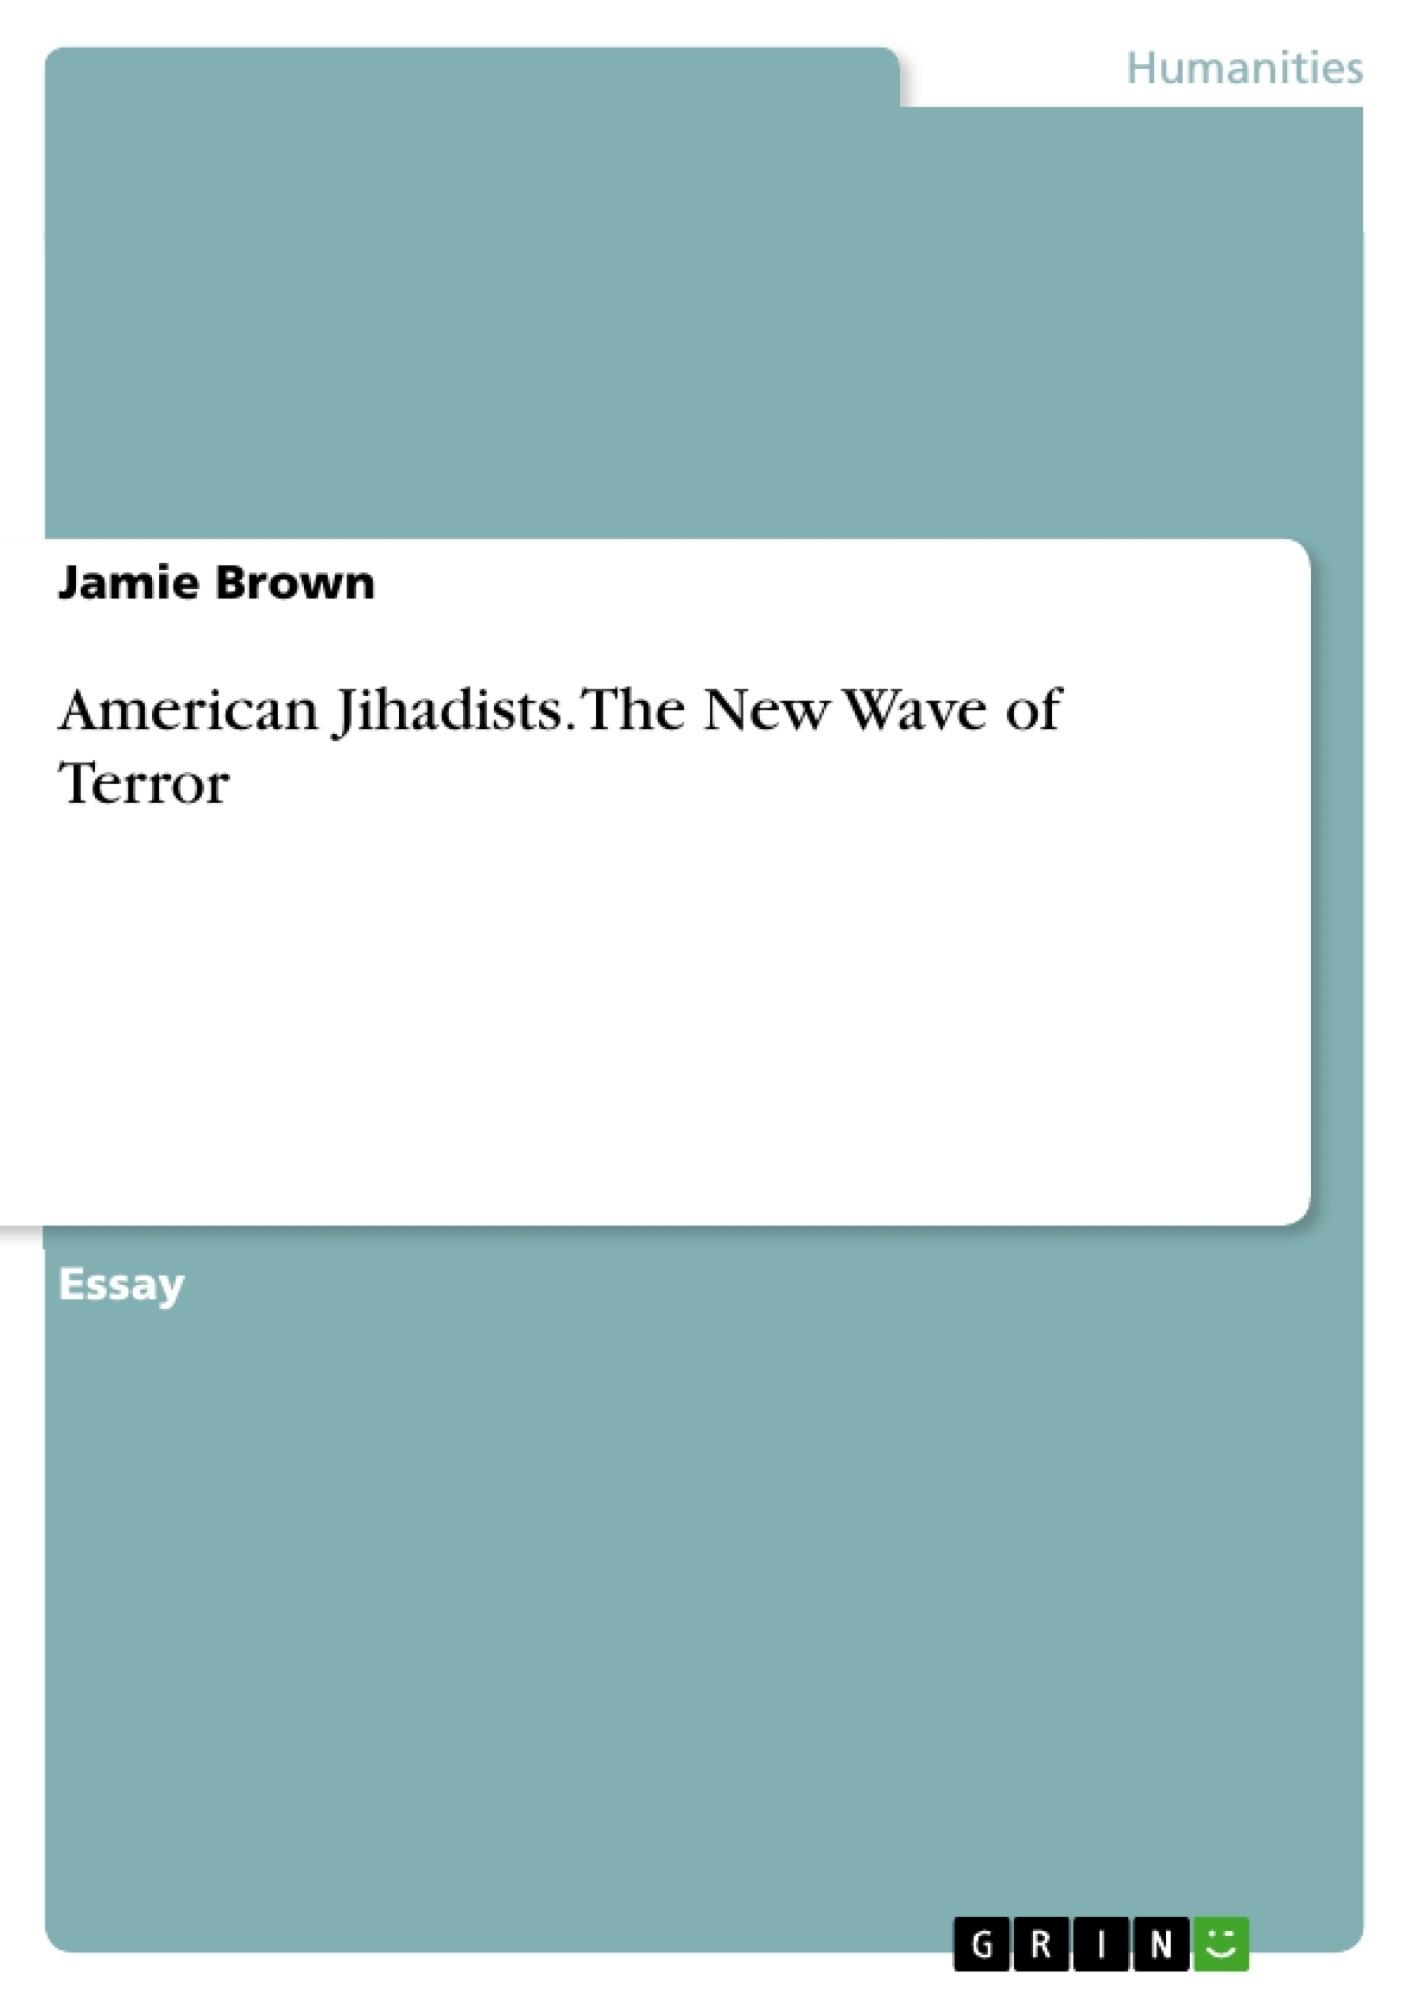 Title: American Jihadists. The New Wave of Terror